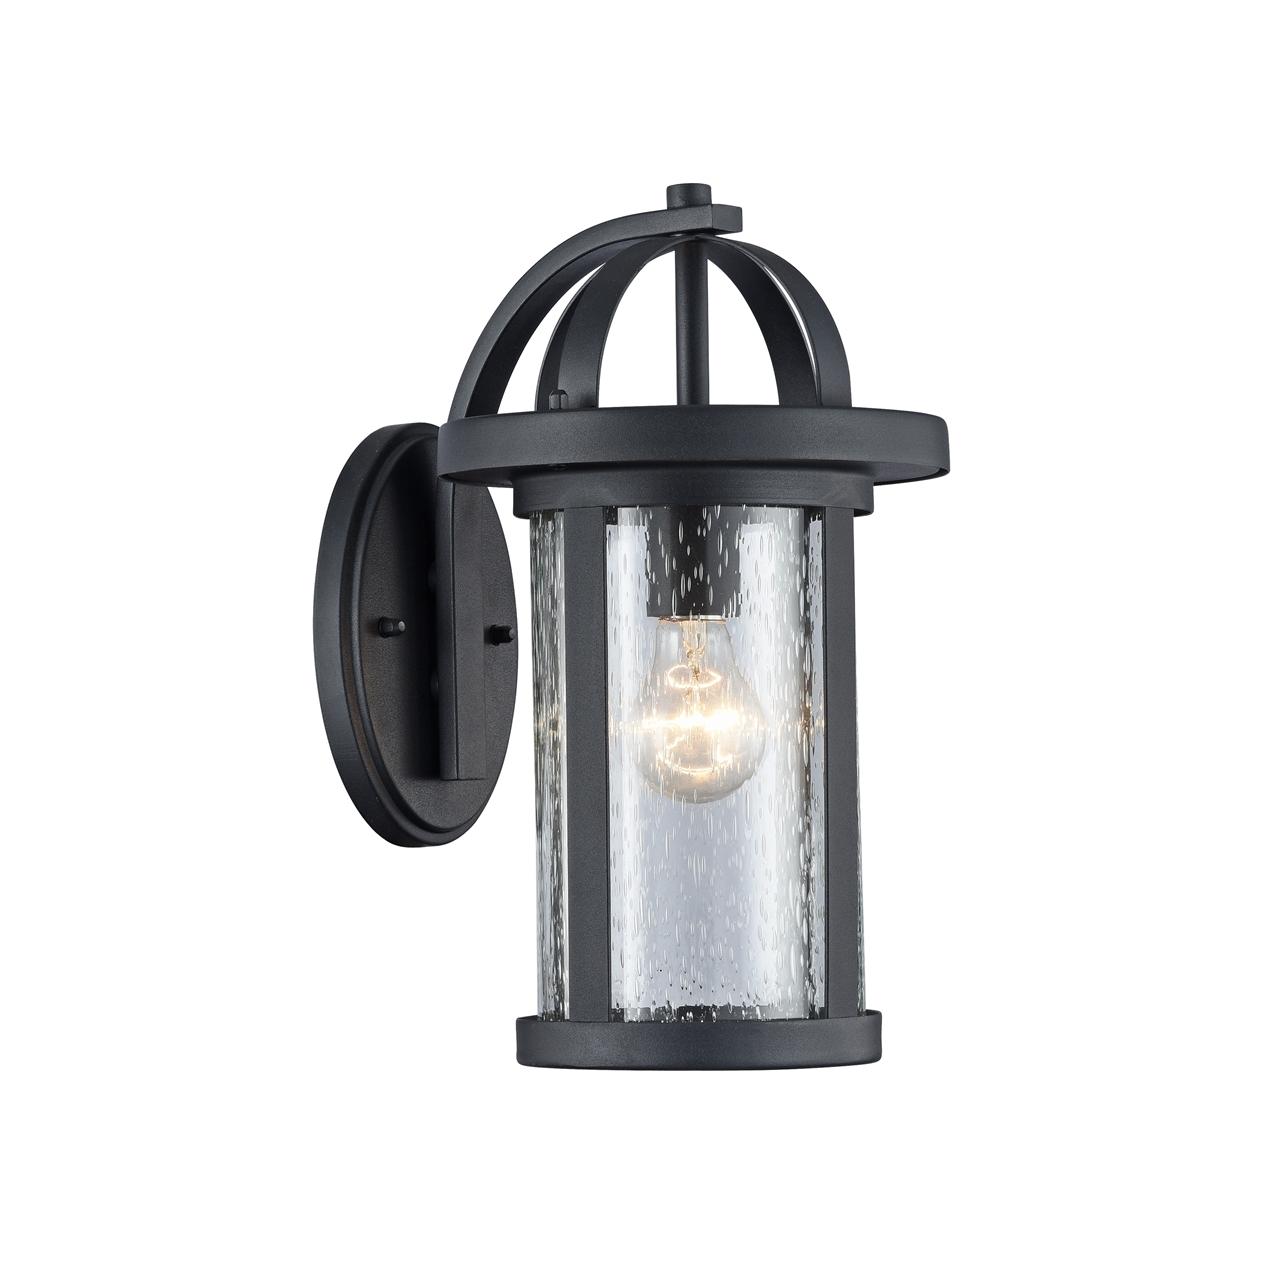 CHLOE Lighting, Inc Lighting wholesale, Lighting wholesalers, Lighting Fixture Wholesale ...